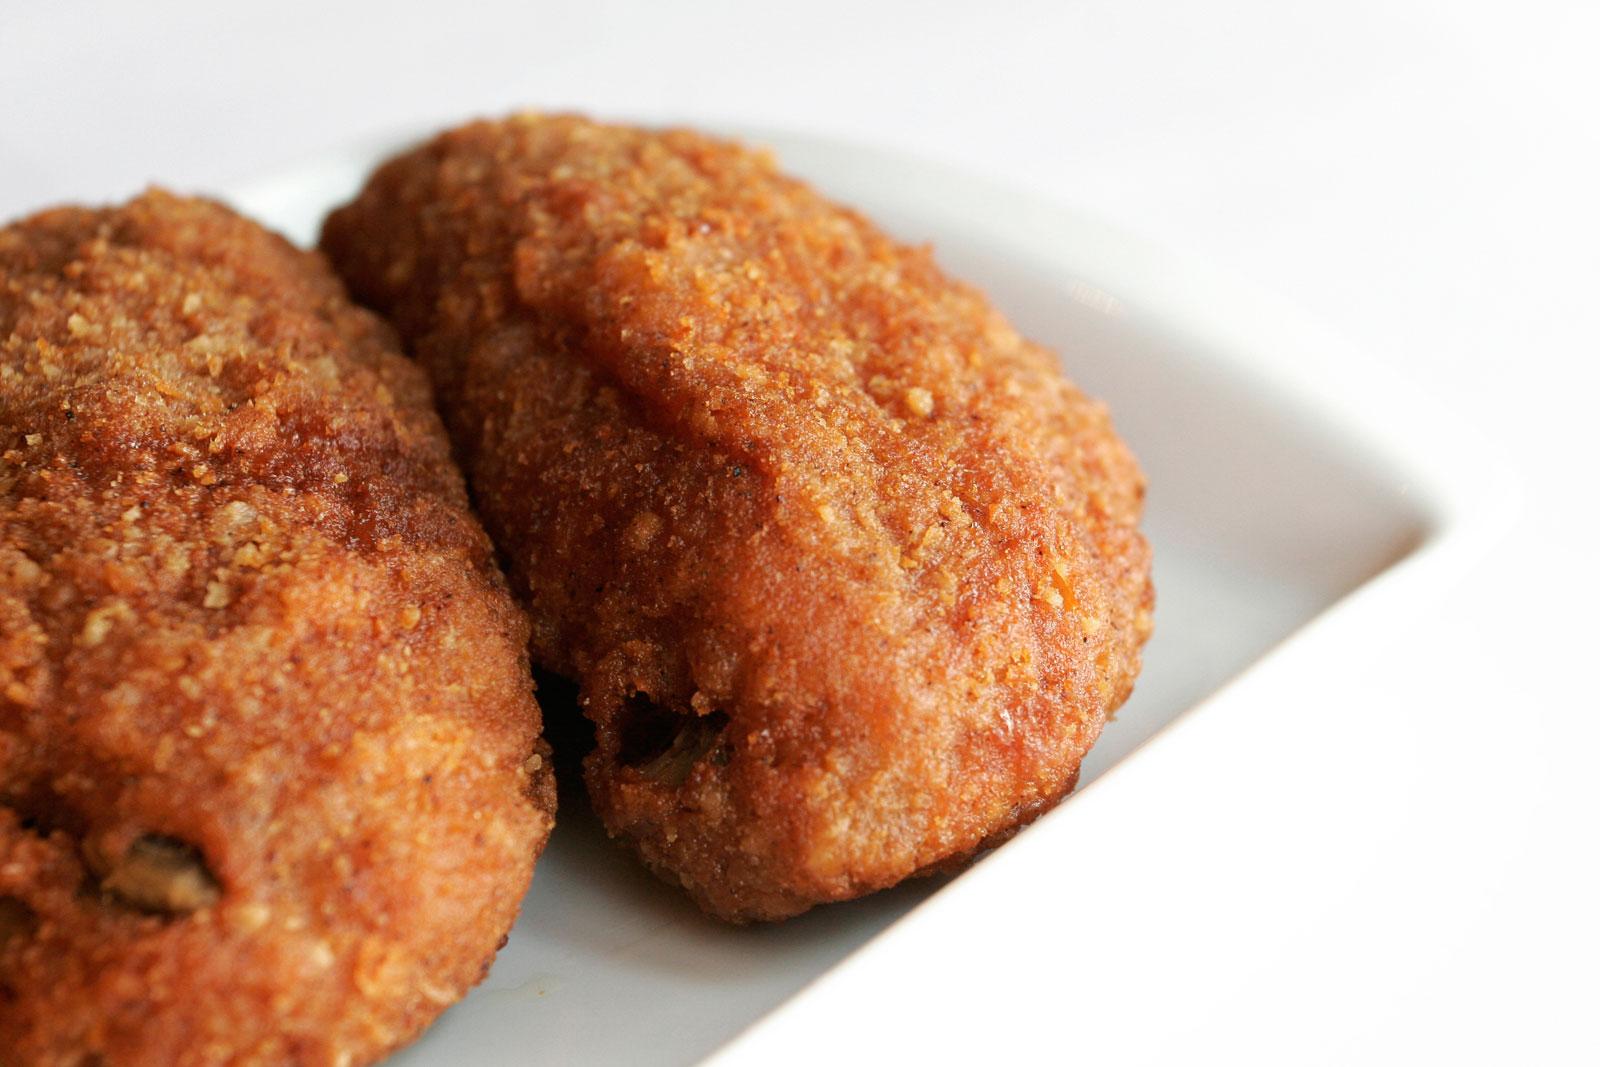 Fast_food_chicken.jpg